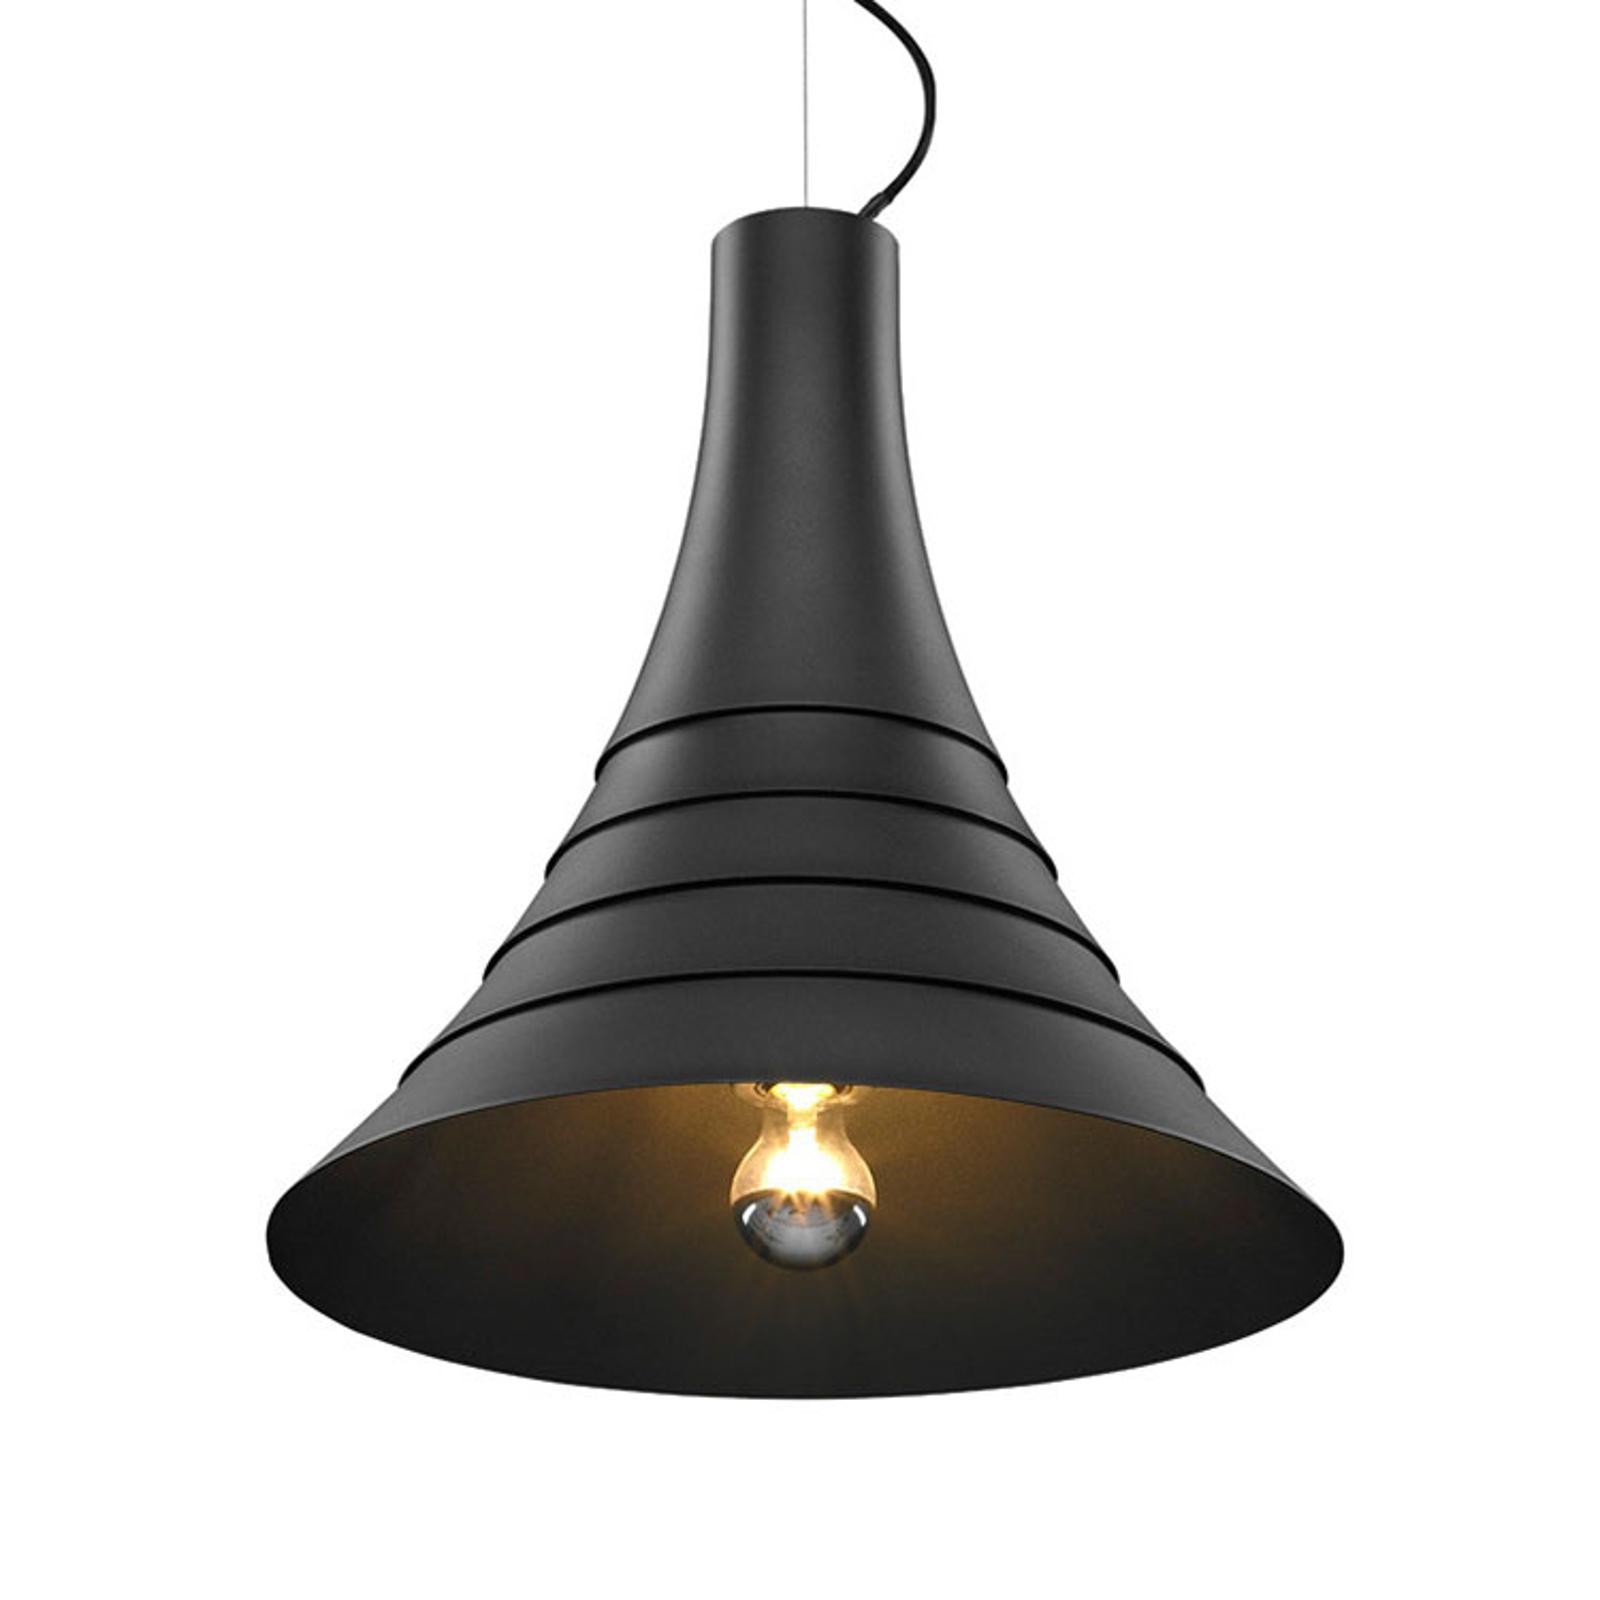 SLV Bato 45 lampa wisząca E27 czarna Ø45cm